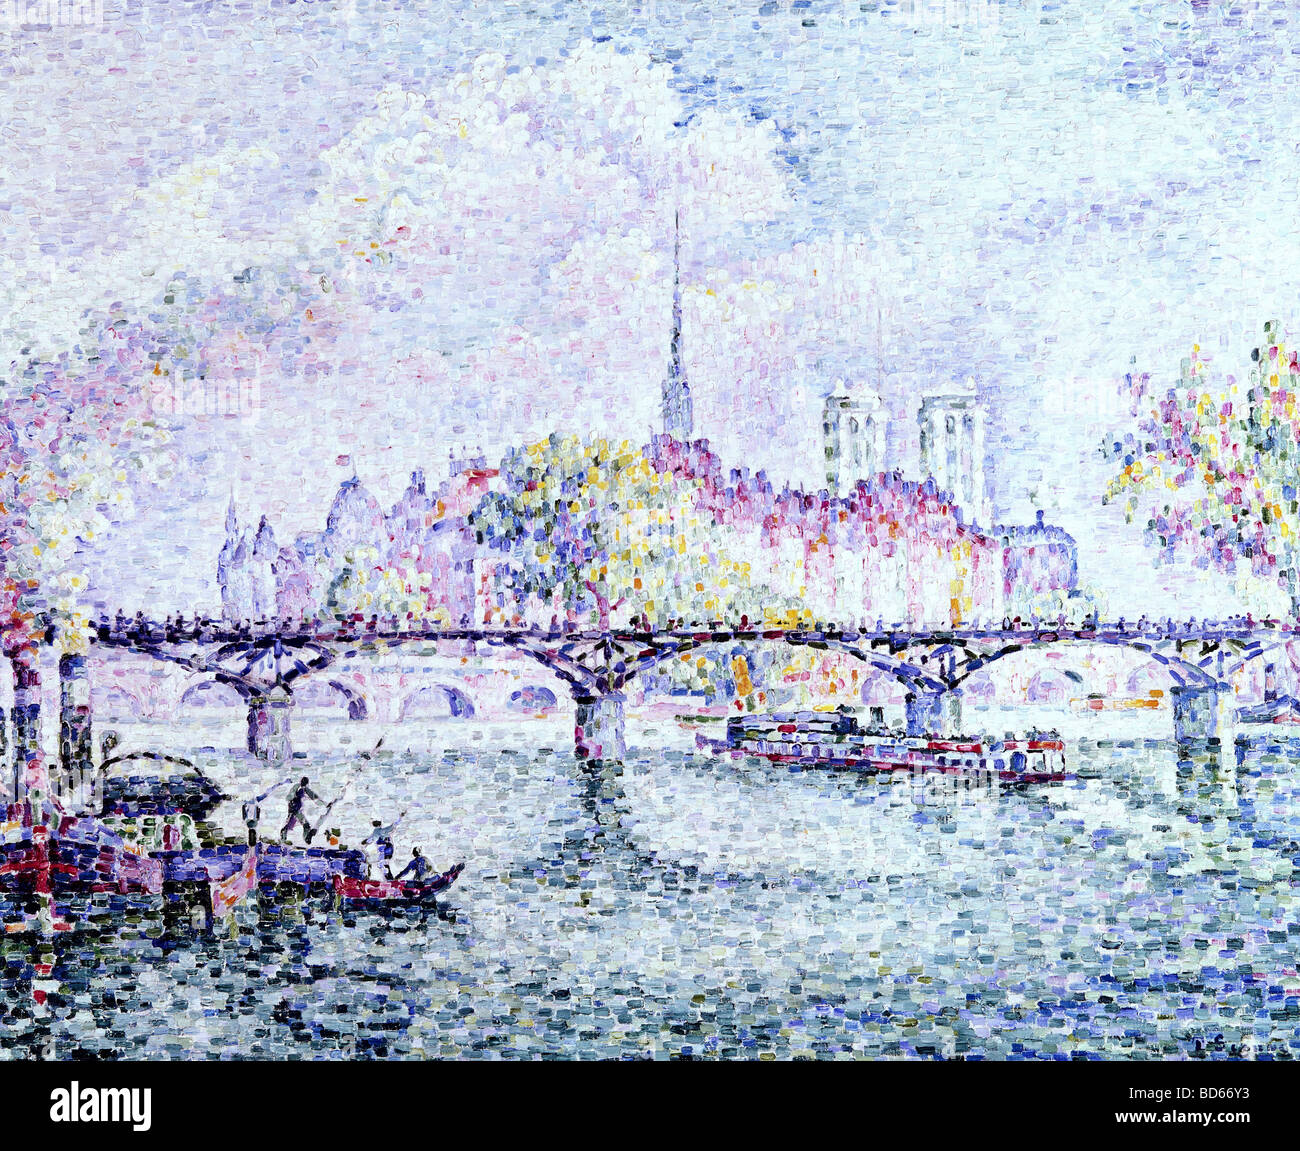 "Bildende Kunst, Signac, Paul, (1863-1935), Malerei, ""Paris, Ile De La Cite"", 1912, Öl auf Leinwand, Museum Folkwang, Stockfoto"